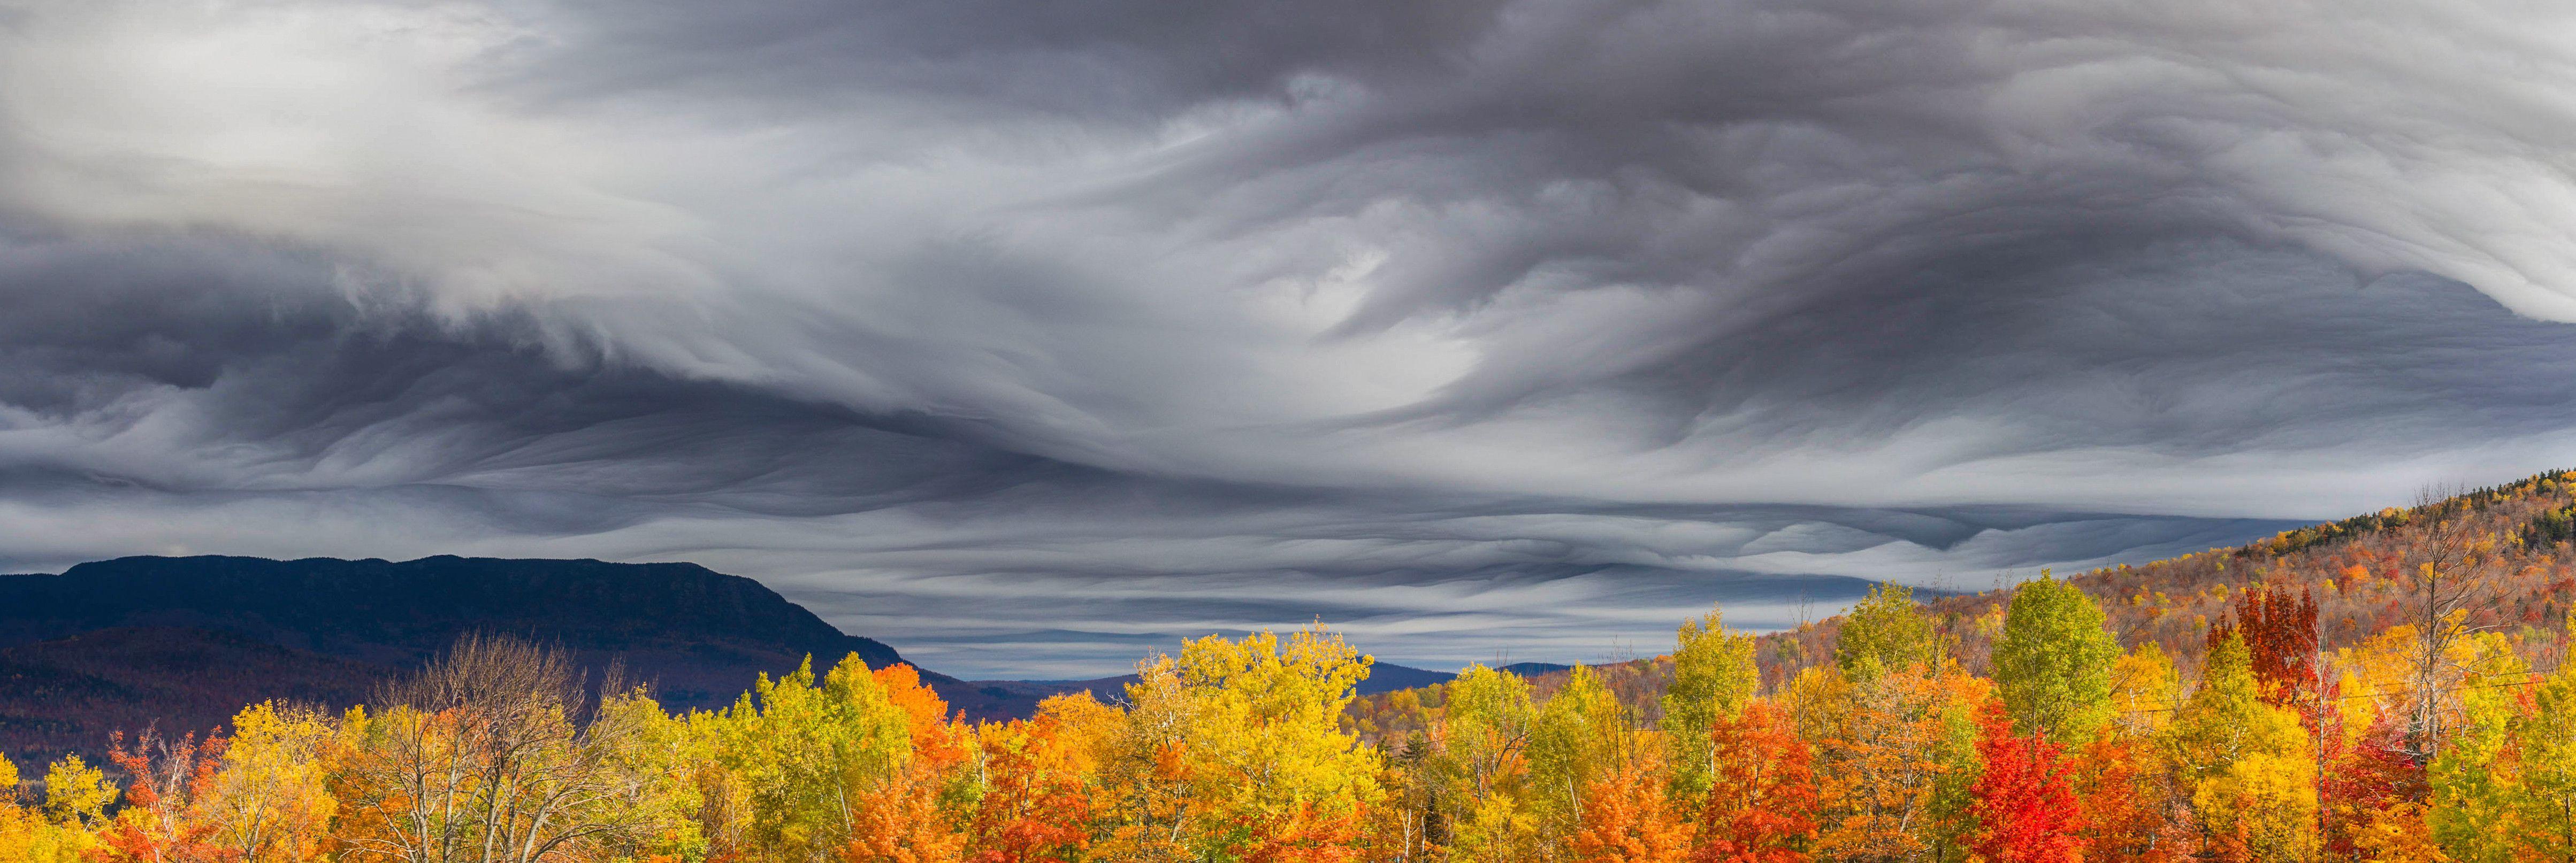 Undulatus asperatus clouds over near-peak foliage in Carrabassett Valley Maine [OC][4815x1614]